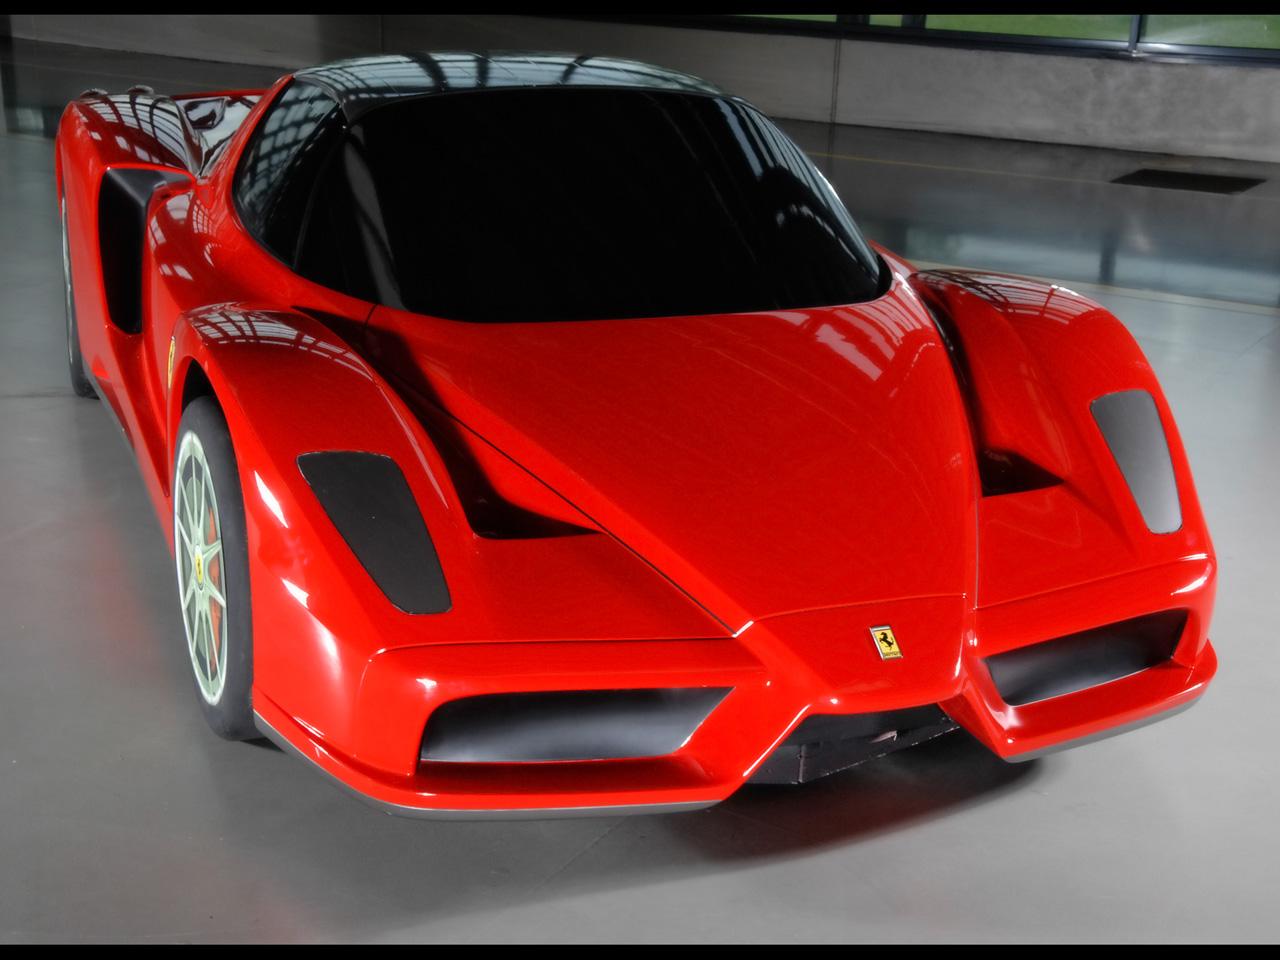 2007 Ferrari Millechili Concept Model Front Angle Top World Cars Desktop Background